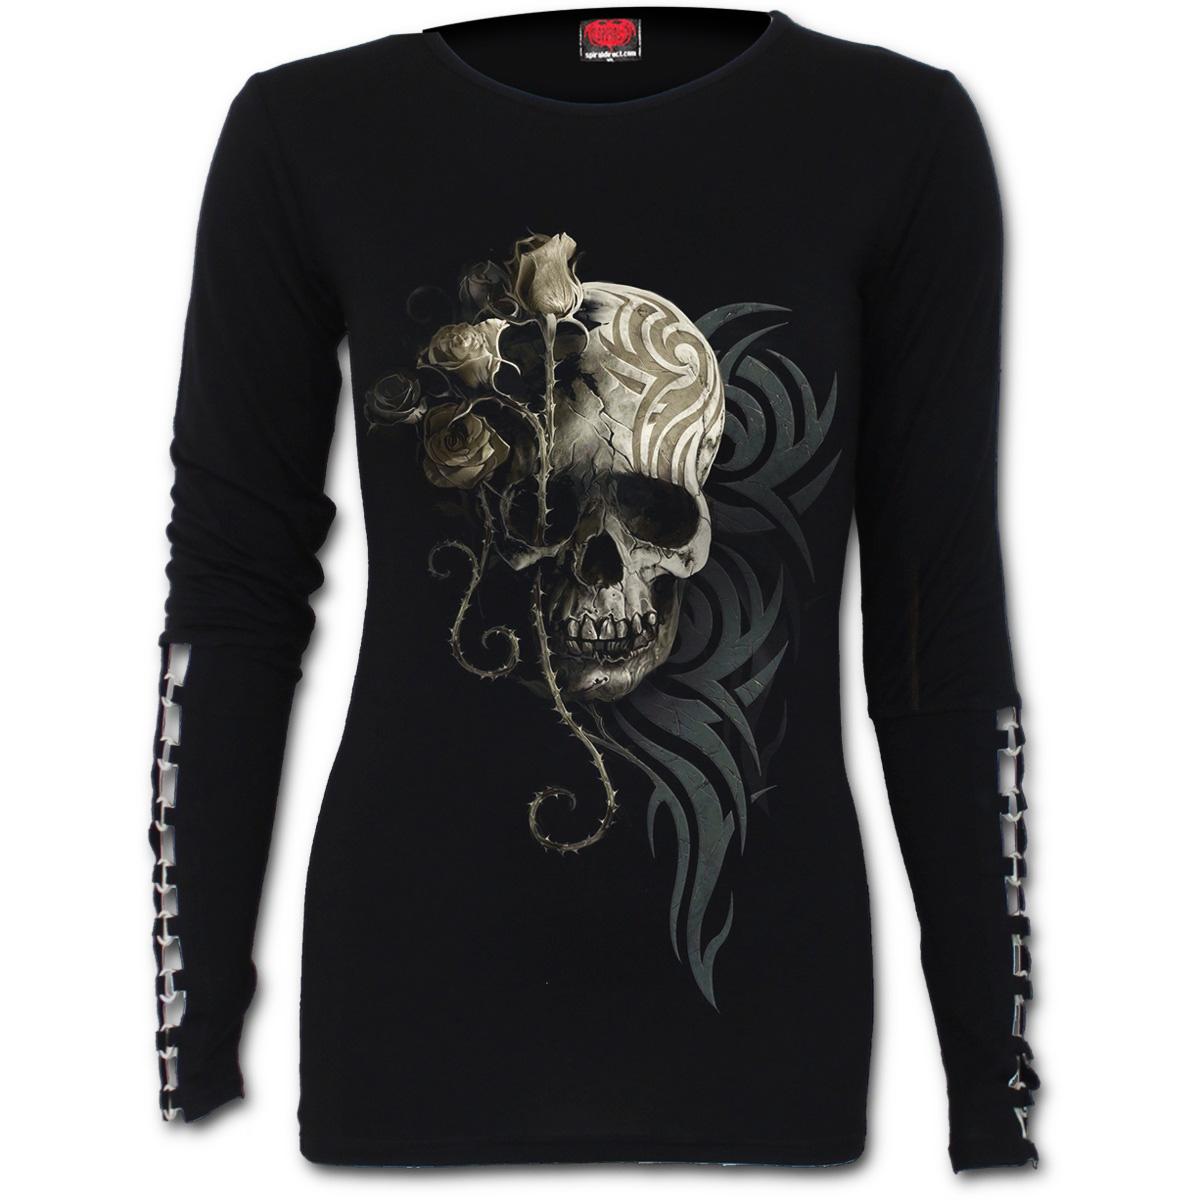 SPIRAL-DIRECT-Ladies-Black-Goth-DARK-ANGEL-Skull-Buckle-L-Sleeve-All-Sizes thumbnail 3